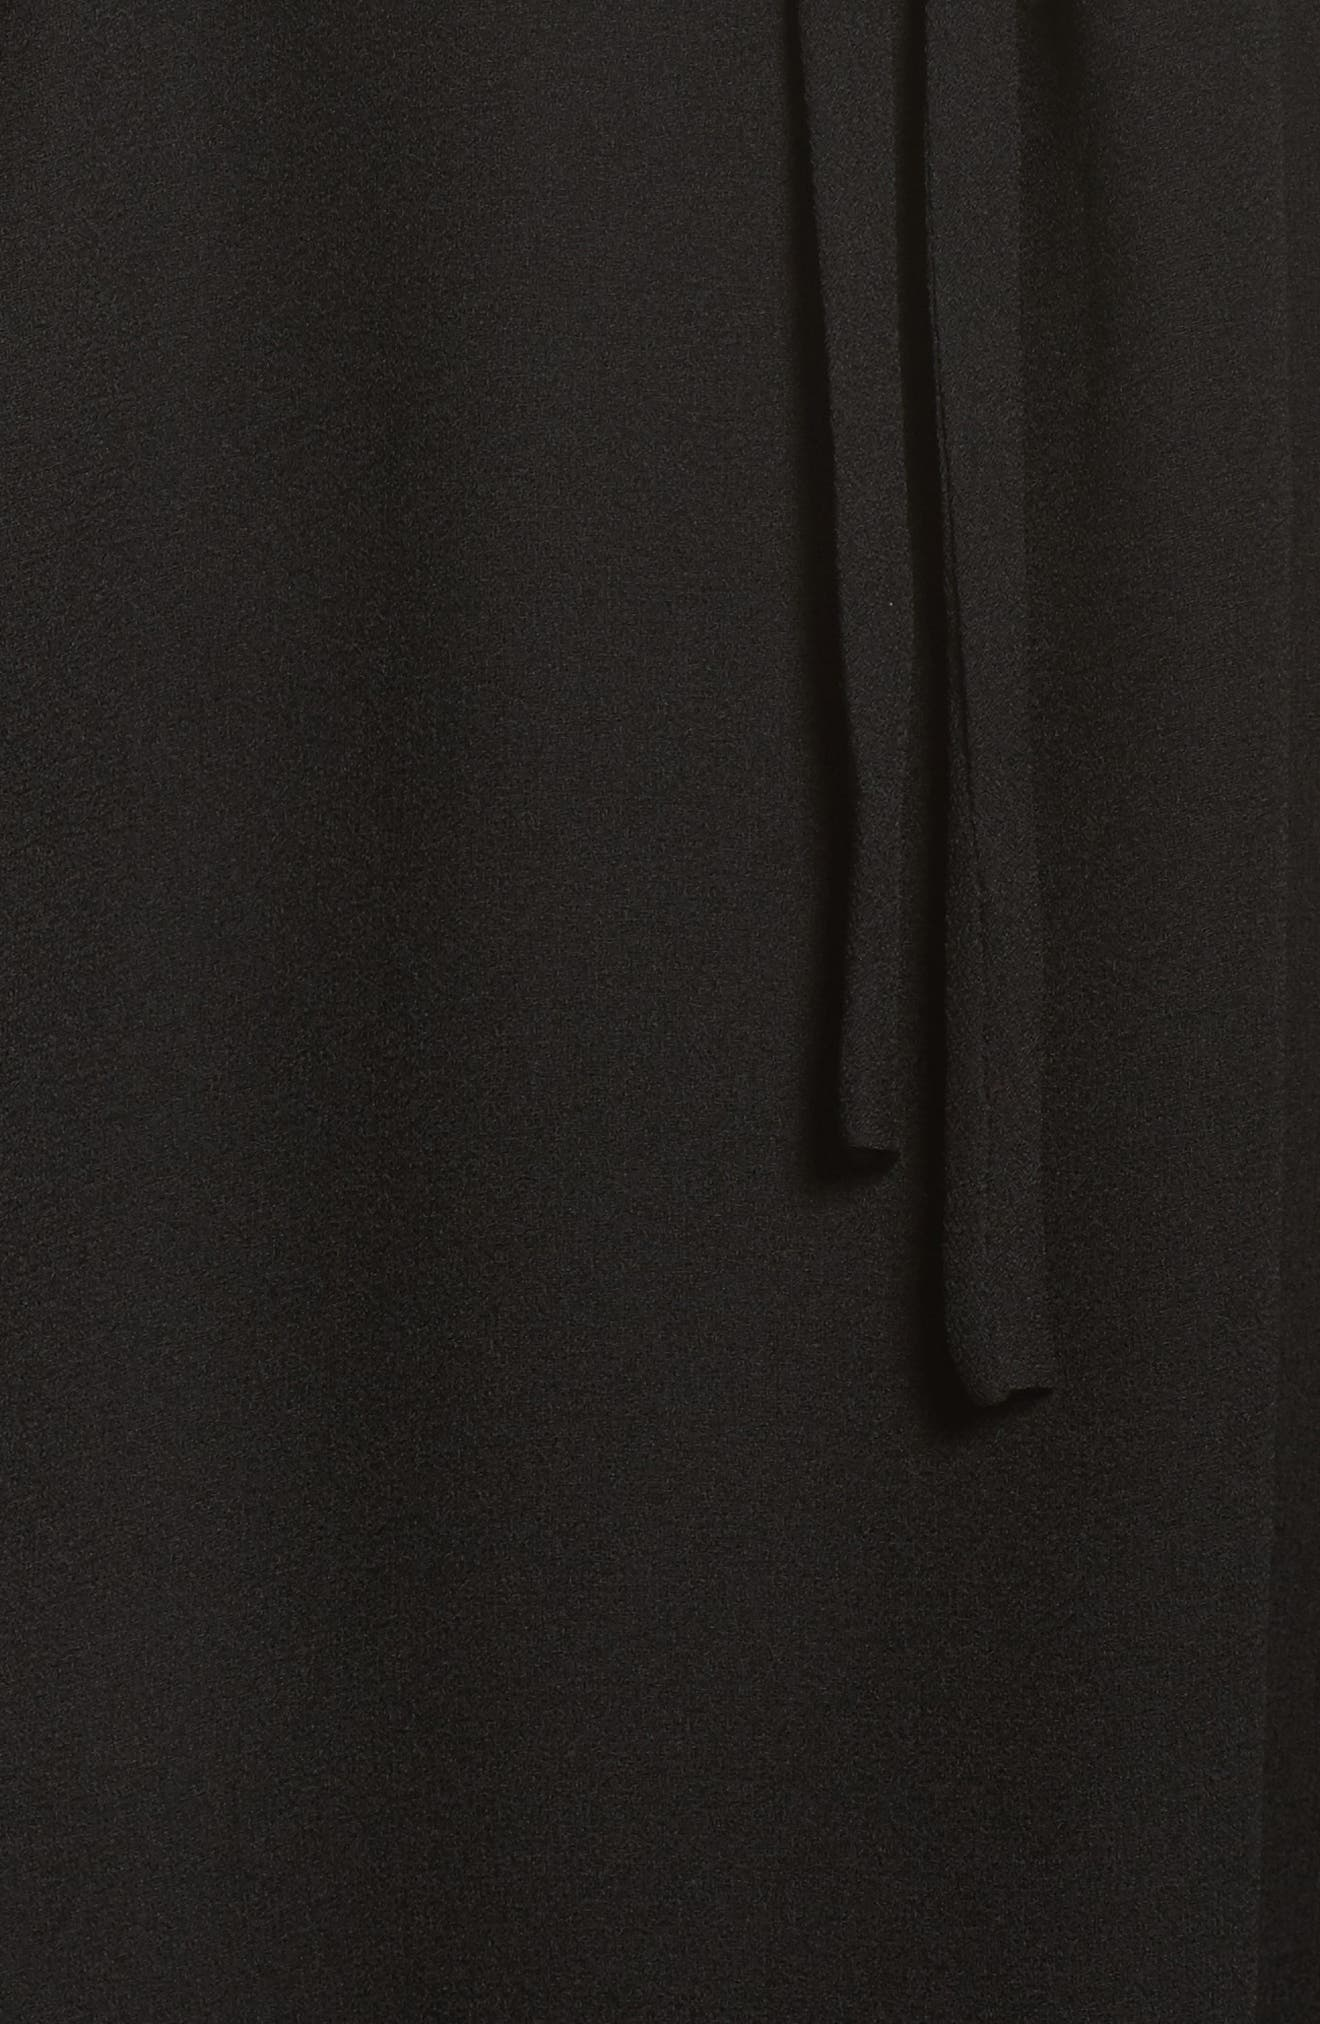 Kayla One-Shoulder Maxi Dress,                             Alternate thumbnail 5, color,                             Black